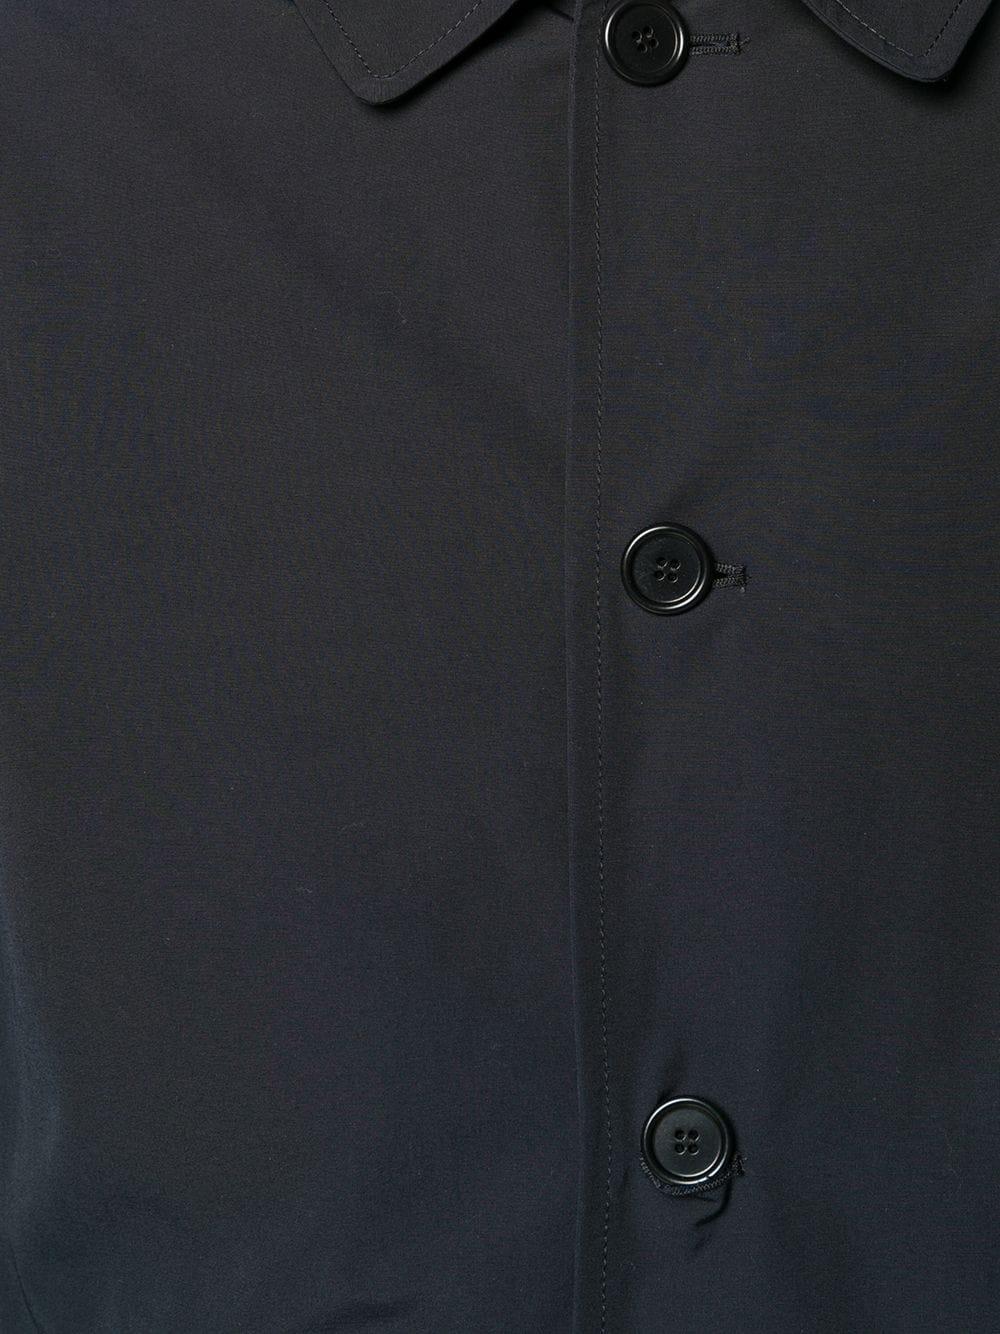 IMPERMEABLE JACKET ASPESI   Jackets   I502 753250101